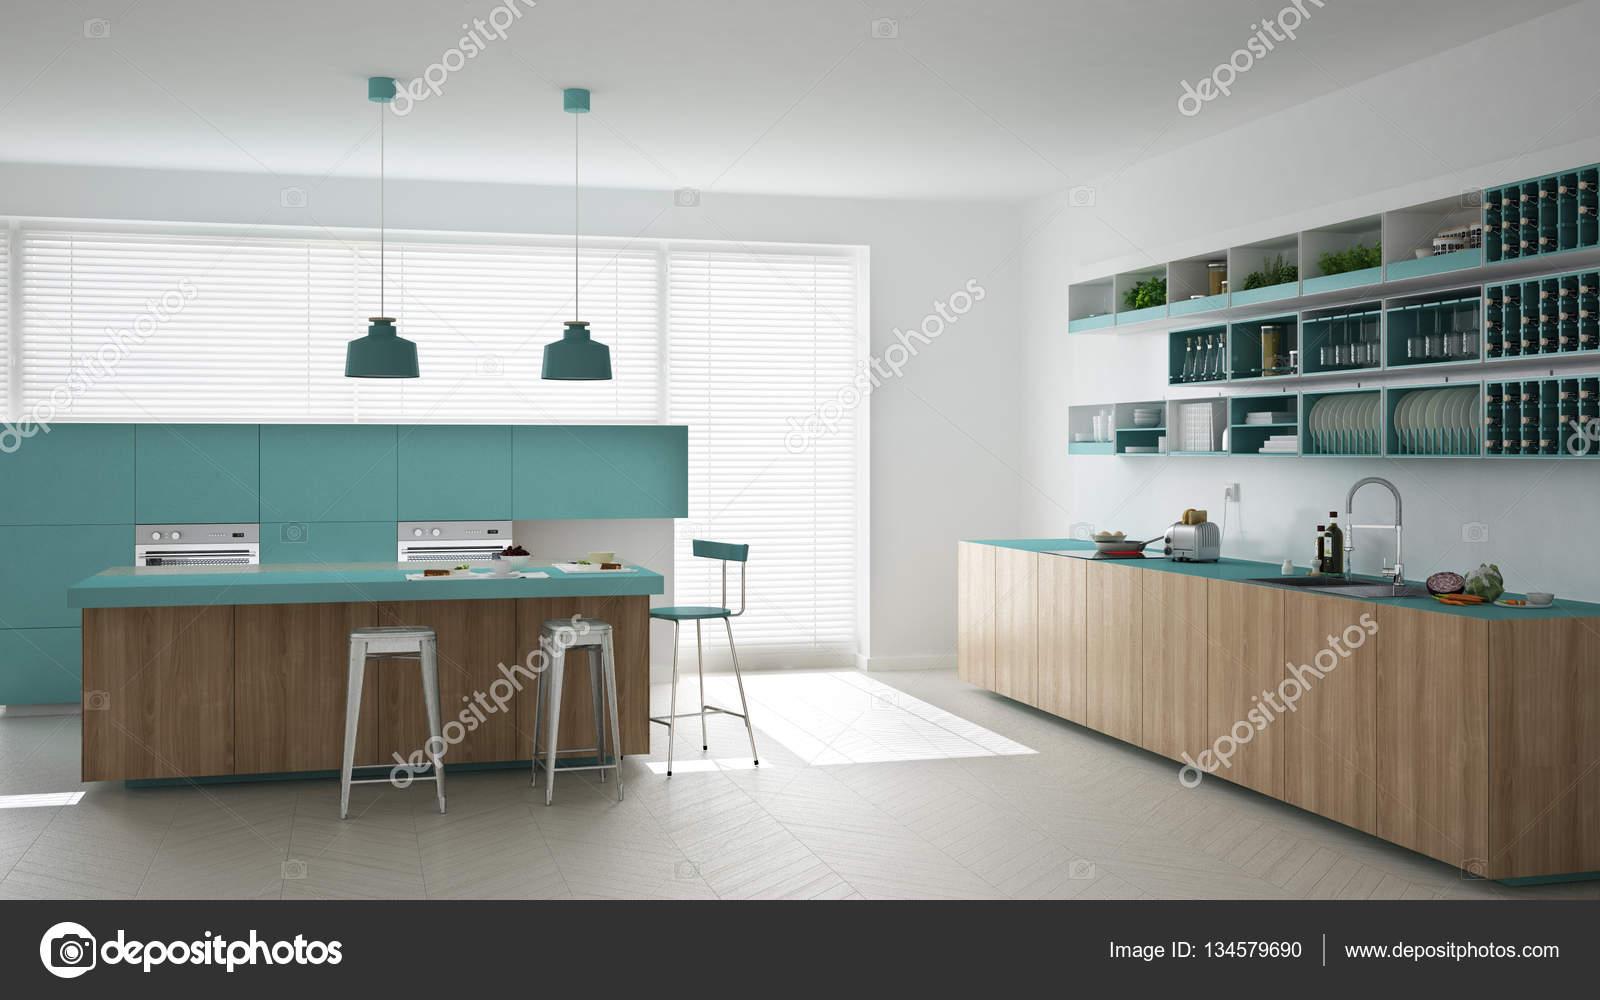 Como diseñar mi cocina descargar programa | Cocina escandinava ...